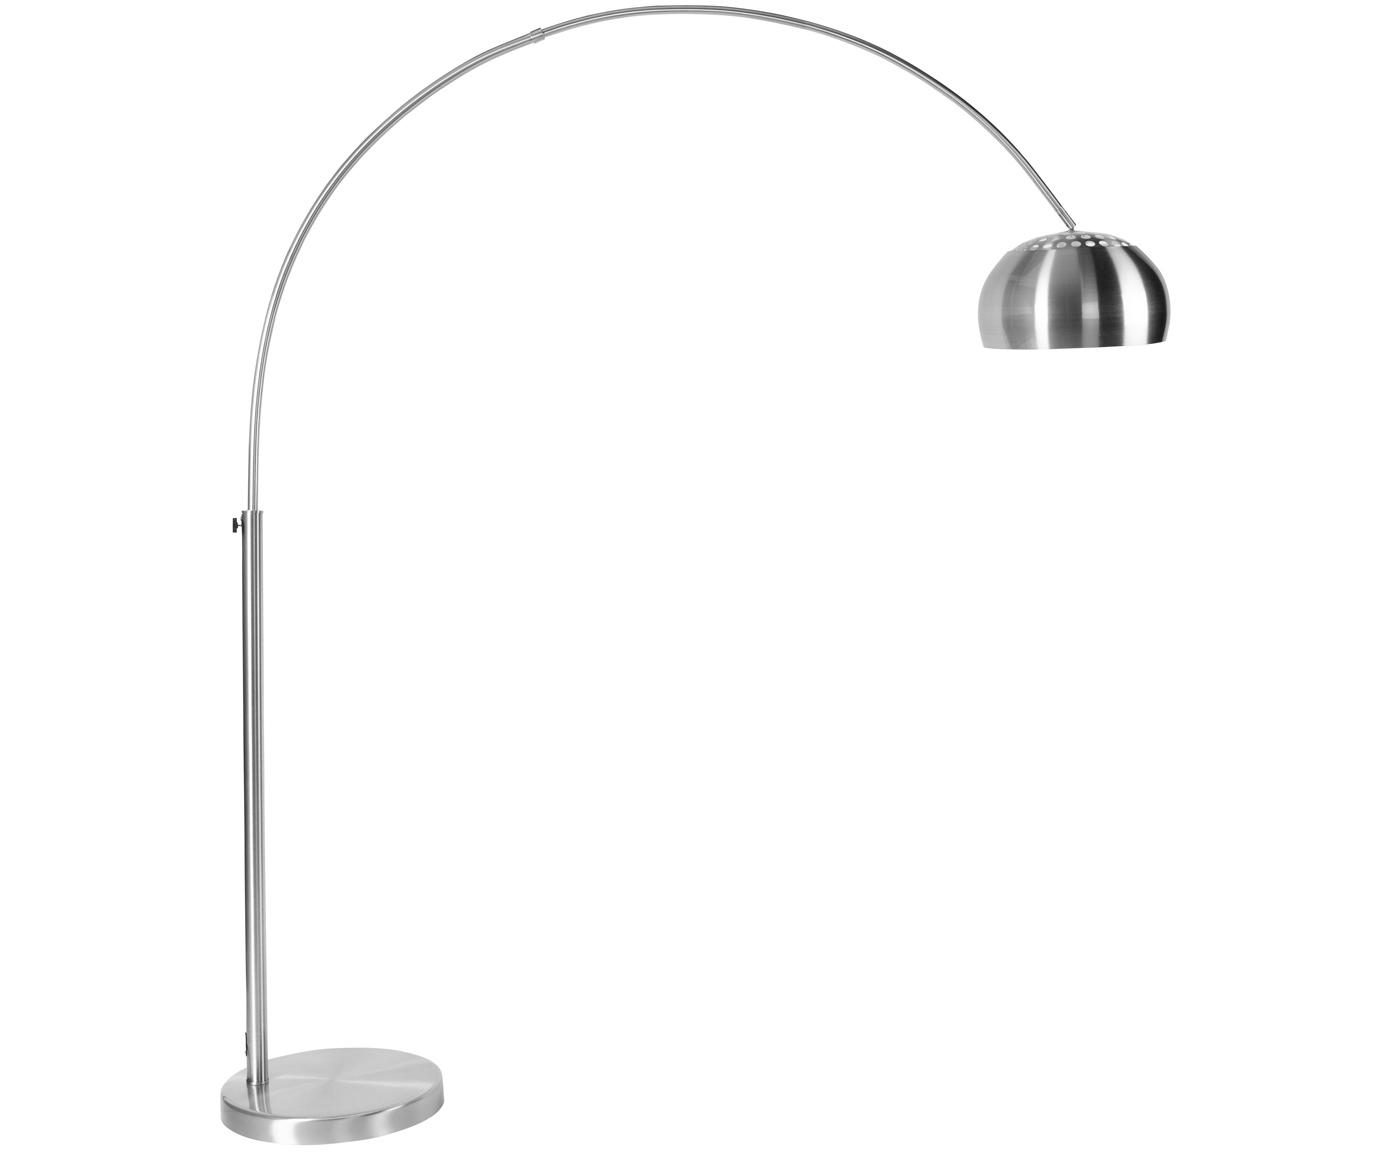 Bogenlampe Metal Bow, höhenverstellbar, Metall, 170 x 205 cm